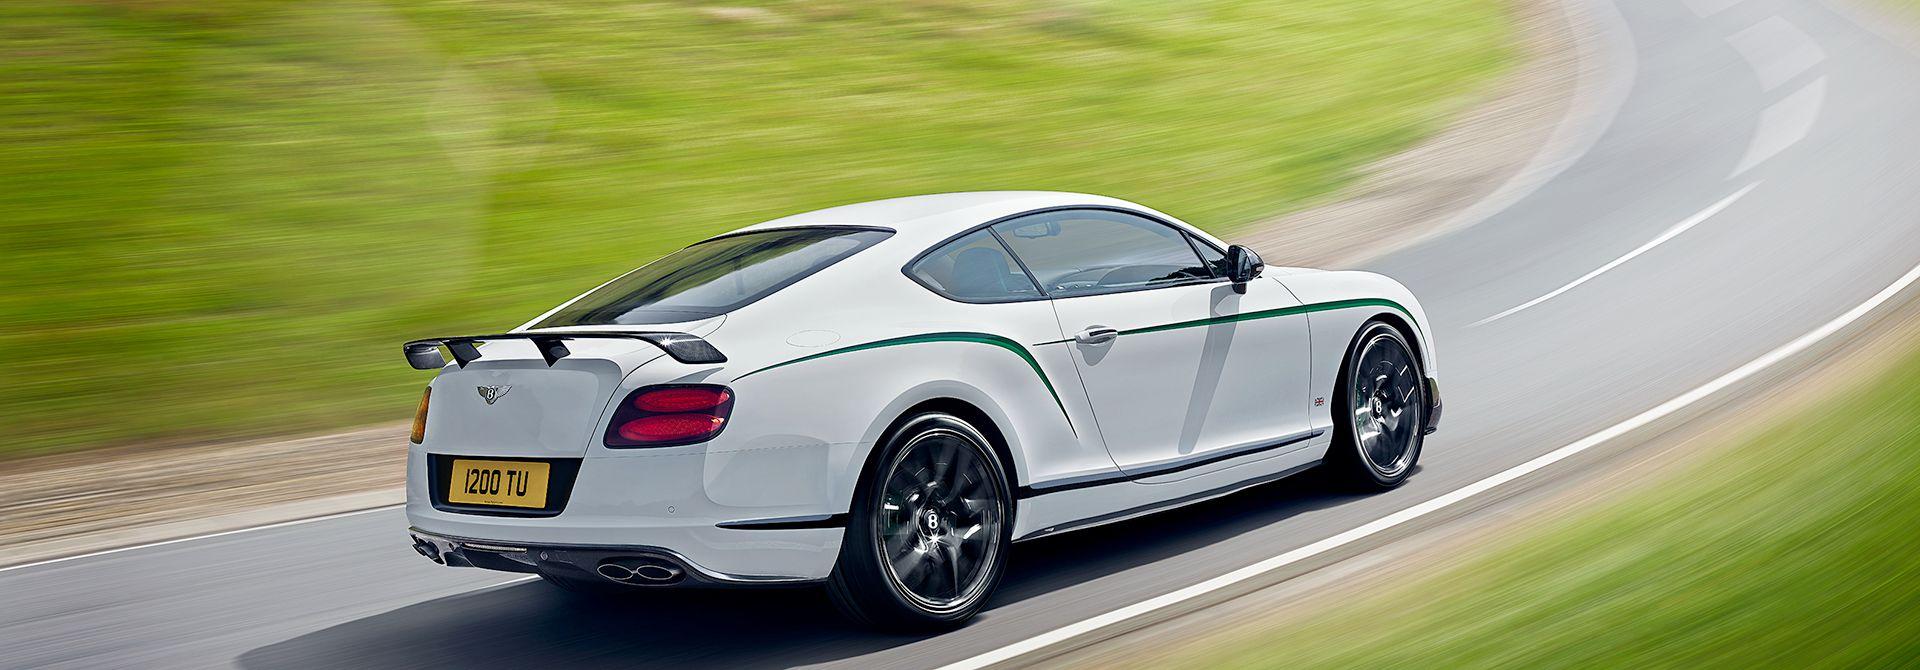 3 6 seconds continental gt3 r cars pinterest cars rolls rh pinterest com